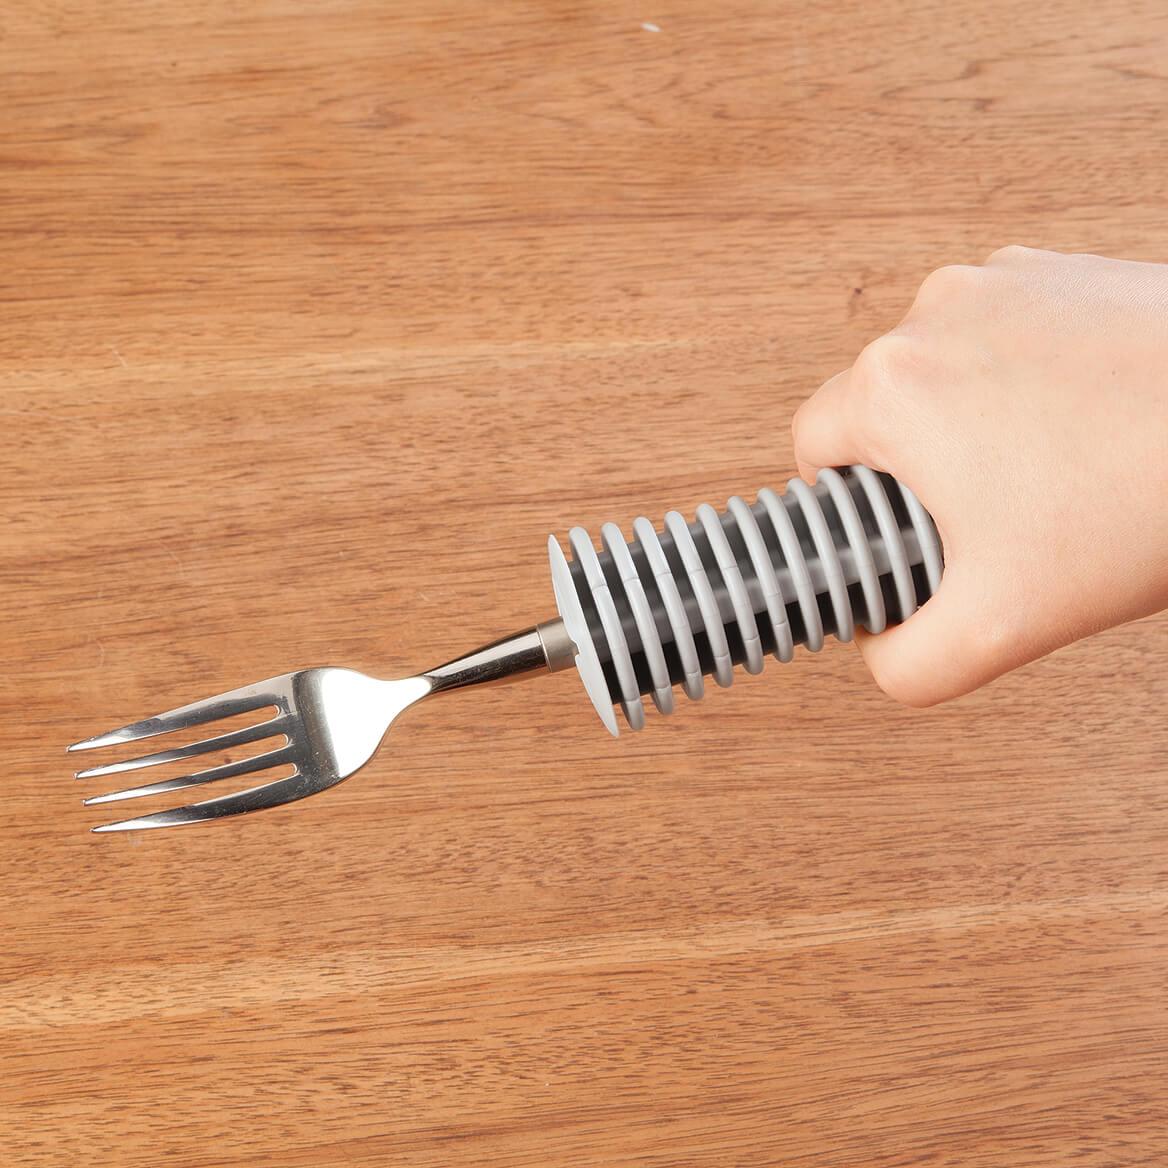 Easy Grip Handle, Set of 4-345274